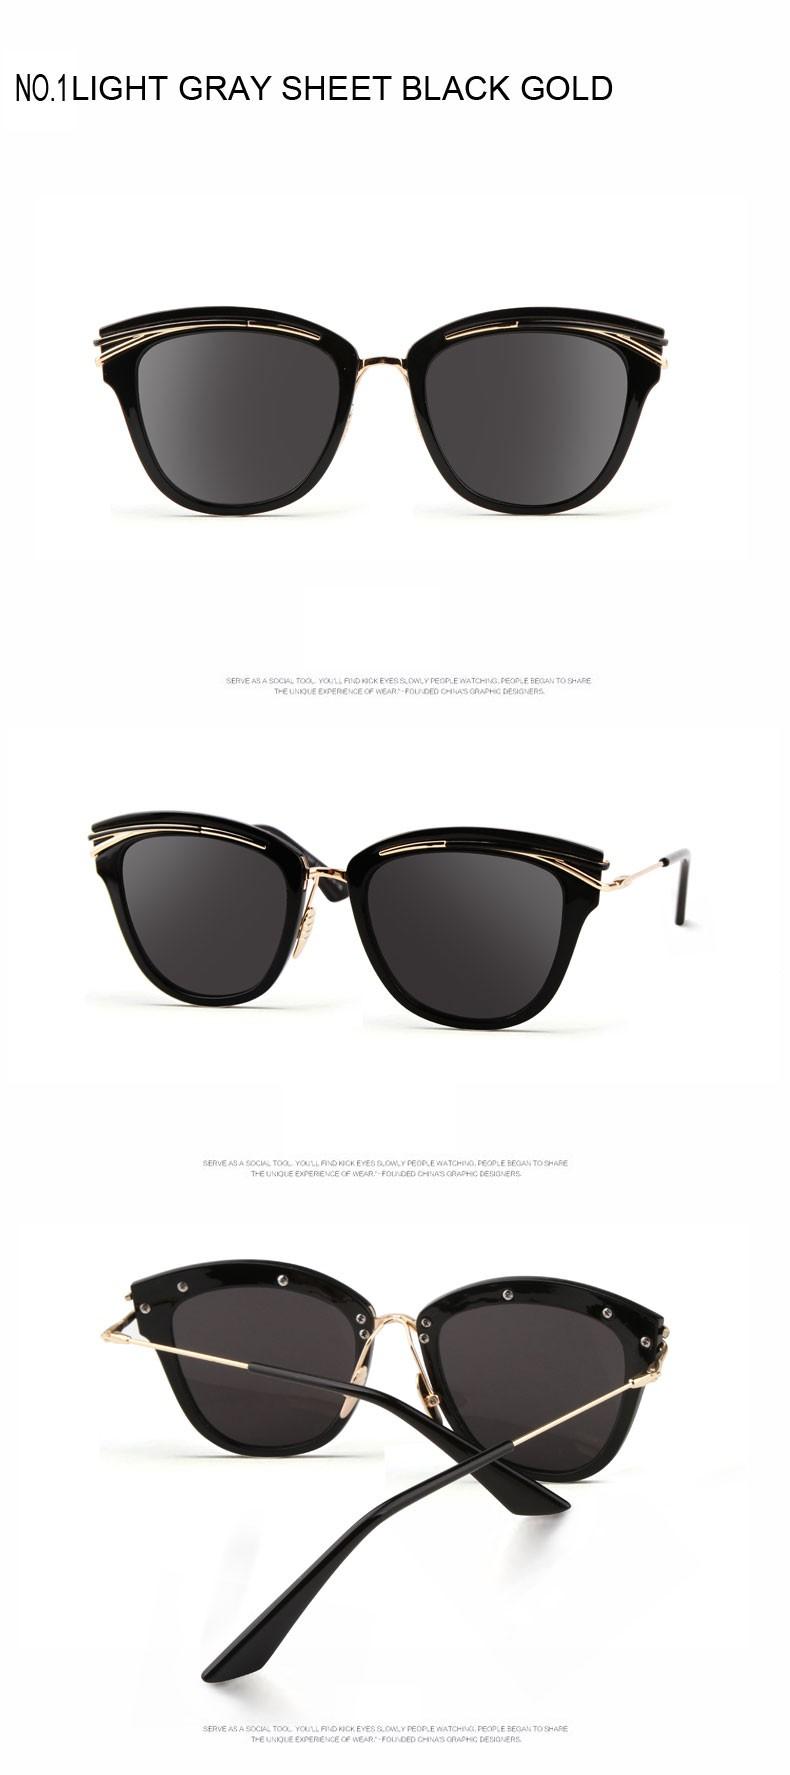 b24b367eaf0947 2017 Brand designer oversized sunglasses Men\'s explosion-proof large frame glasses  Women\'s fashion flat mirror Sunglasses womanUSD 19.00/piece